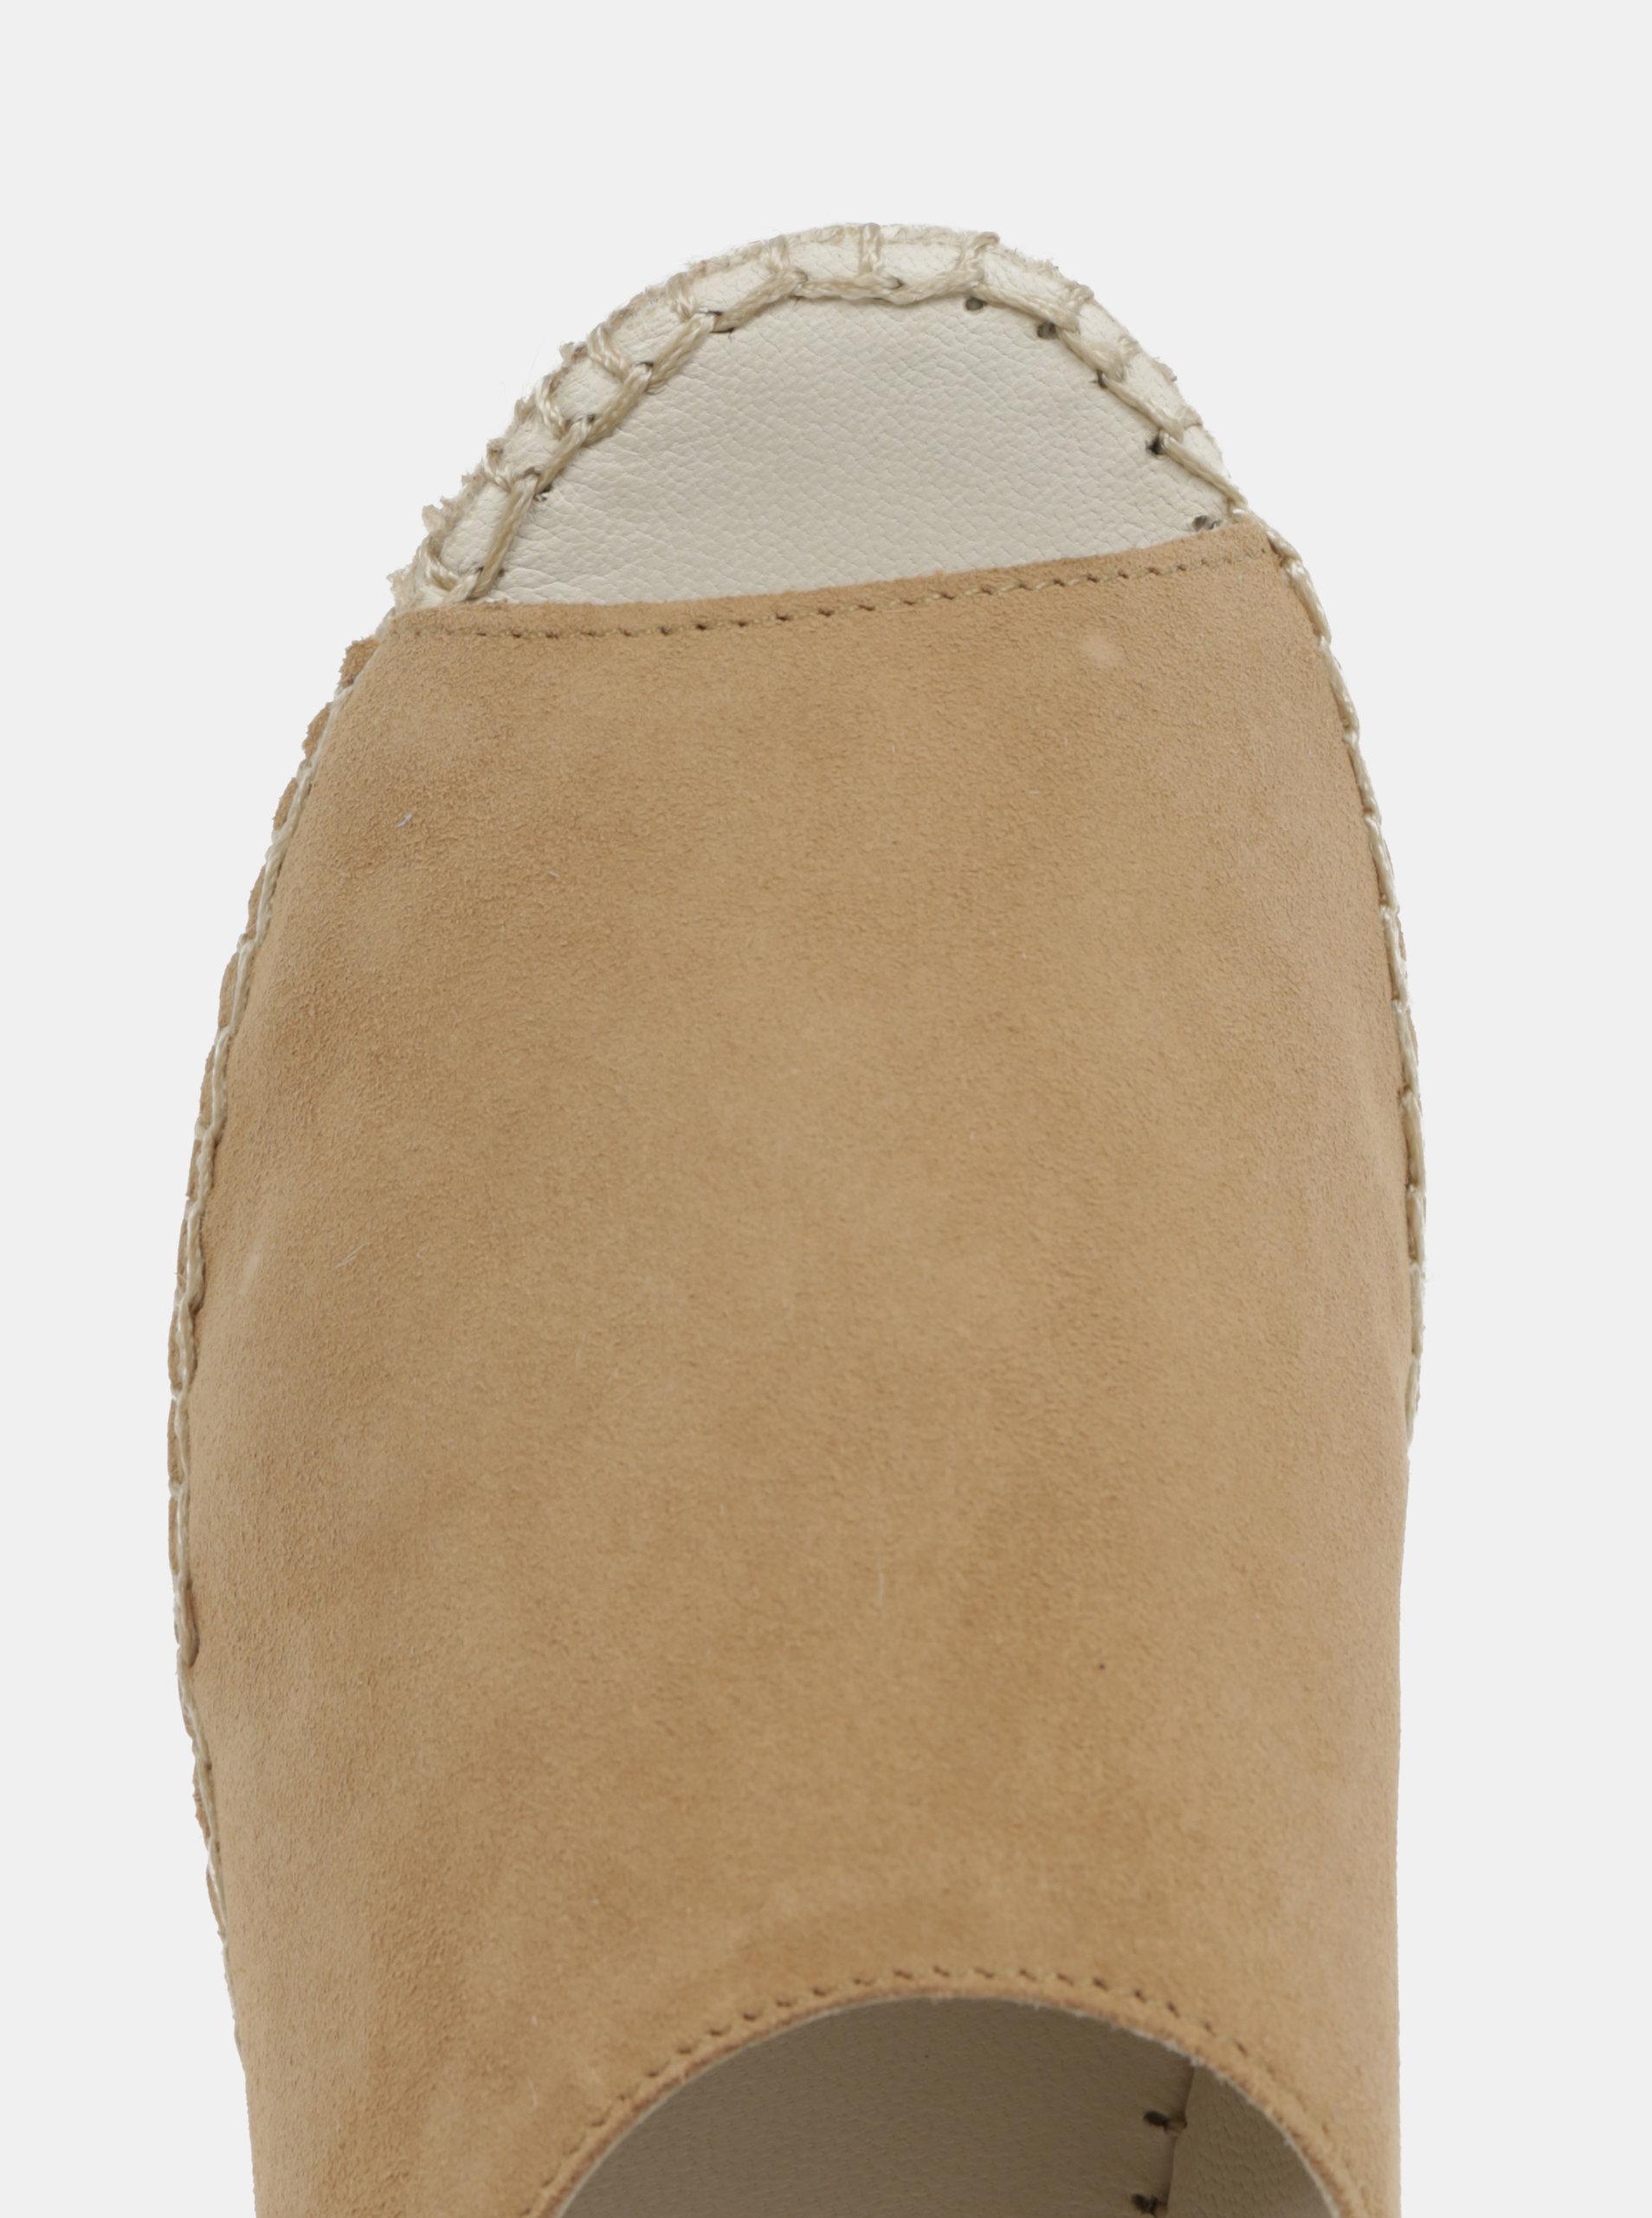 dced05d6a2c3 Béžové dámske semišové sandále na platforme Vagabond Celeste ...